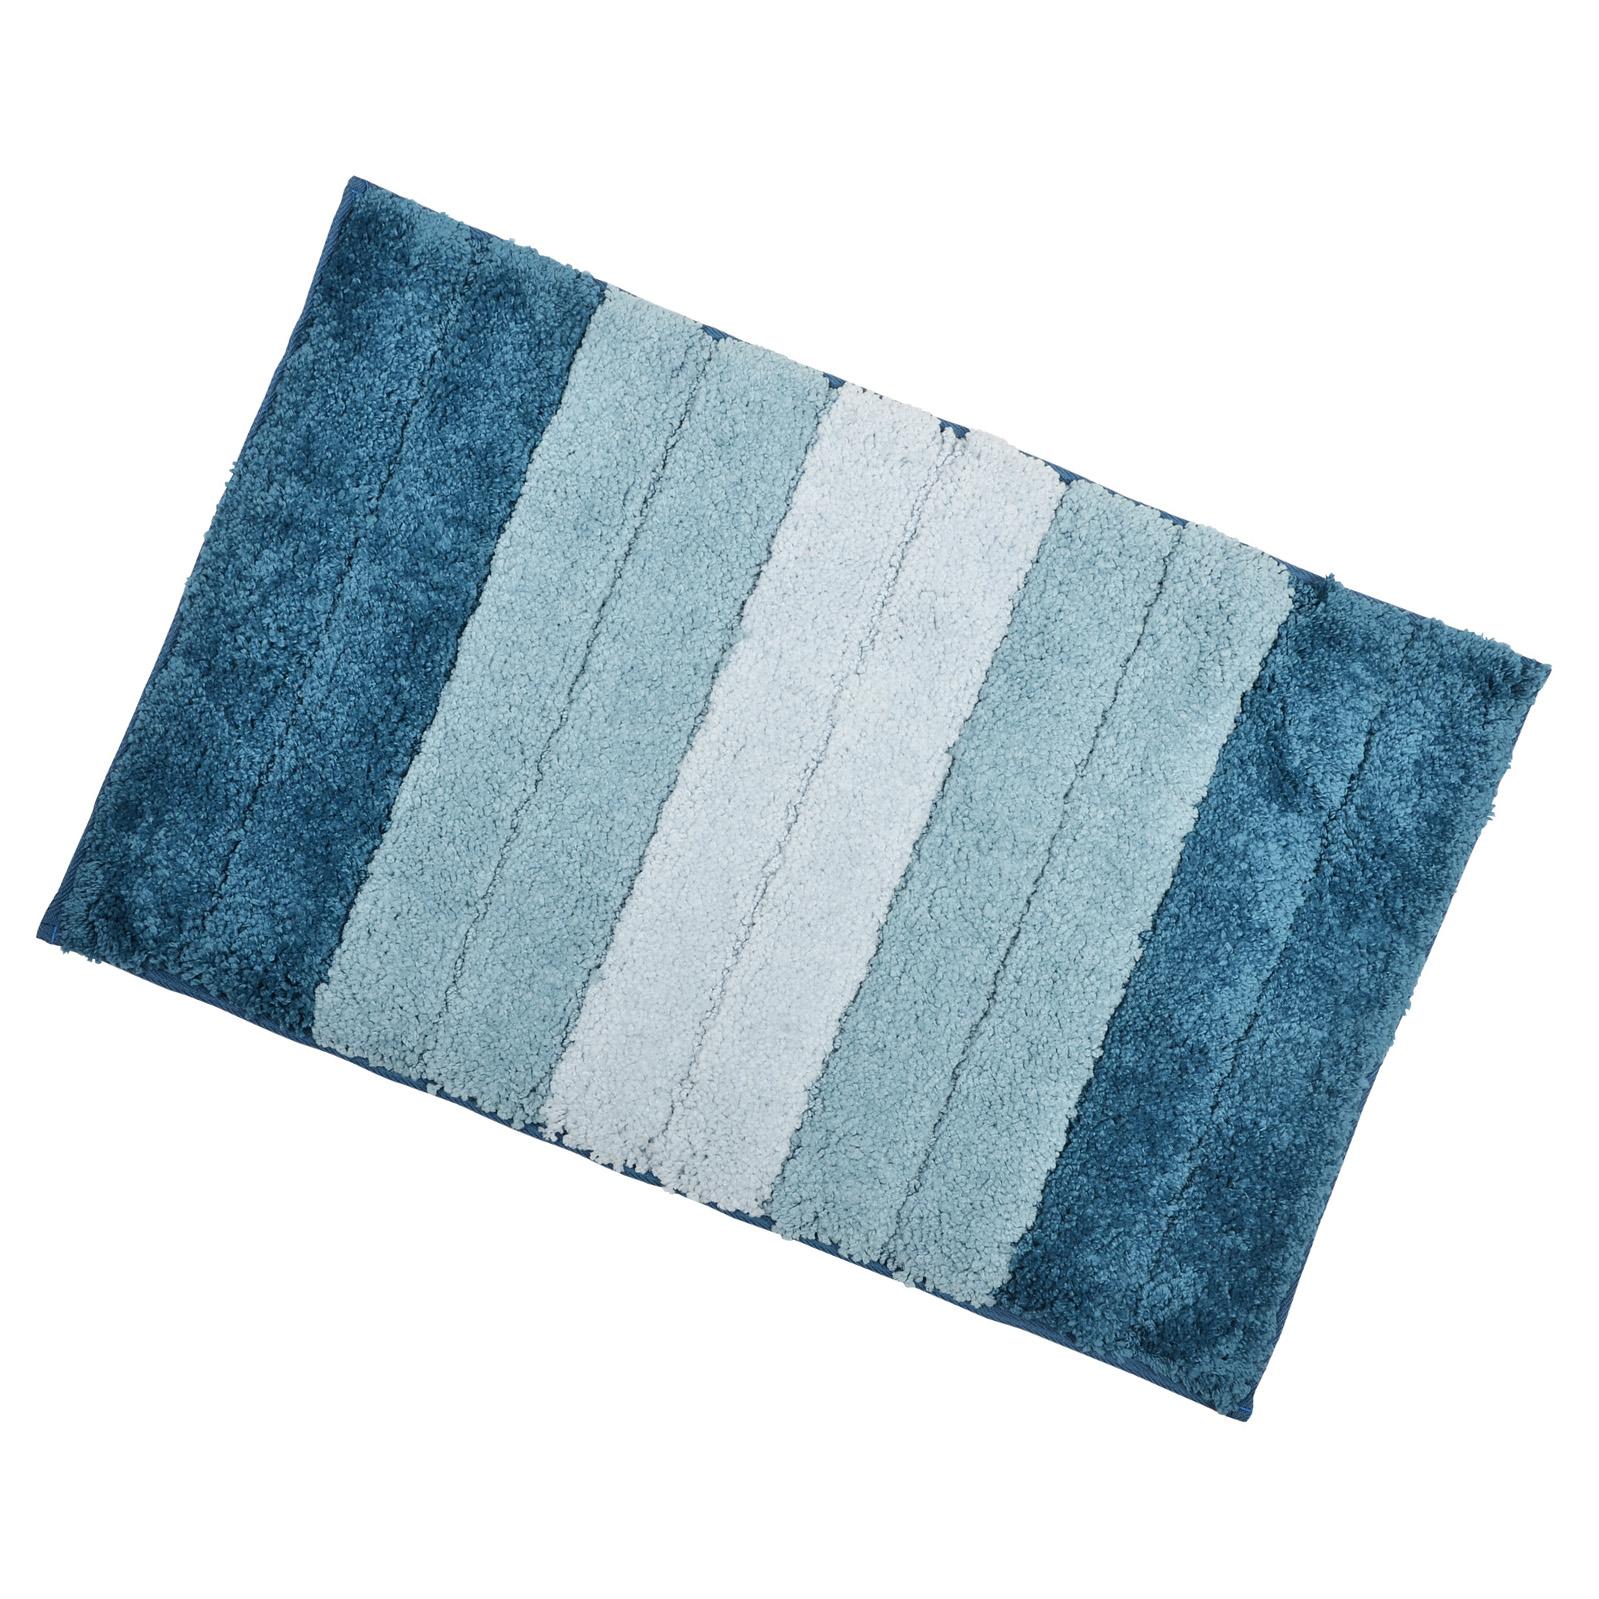 Soft Tufted Microfibre Bathroom Shower Bath Mat Rug Non slip Back